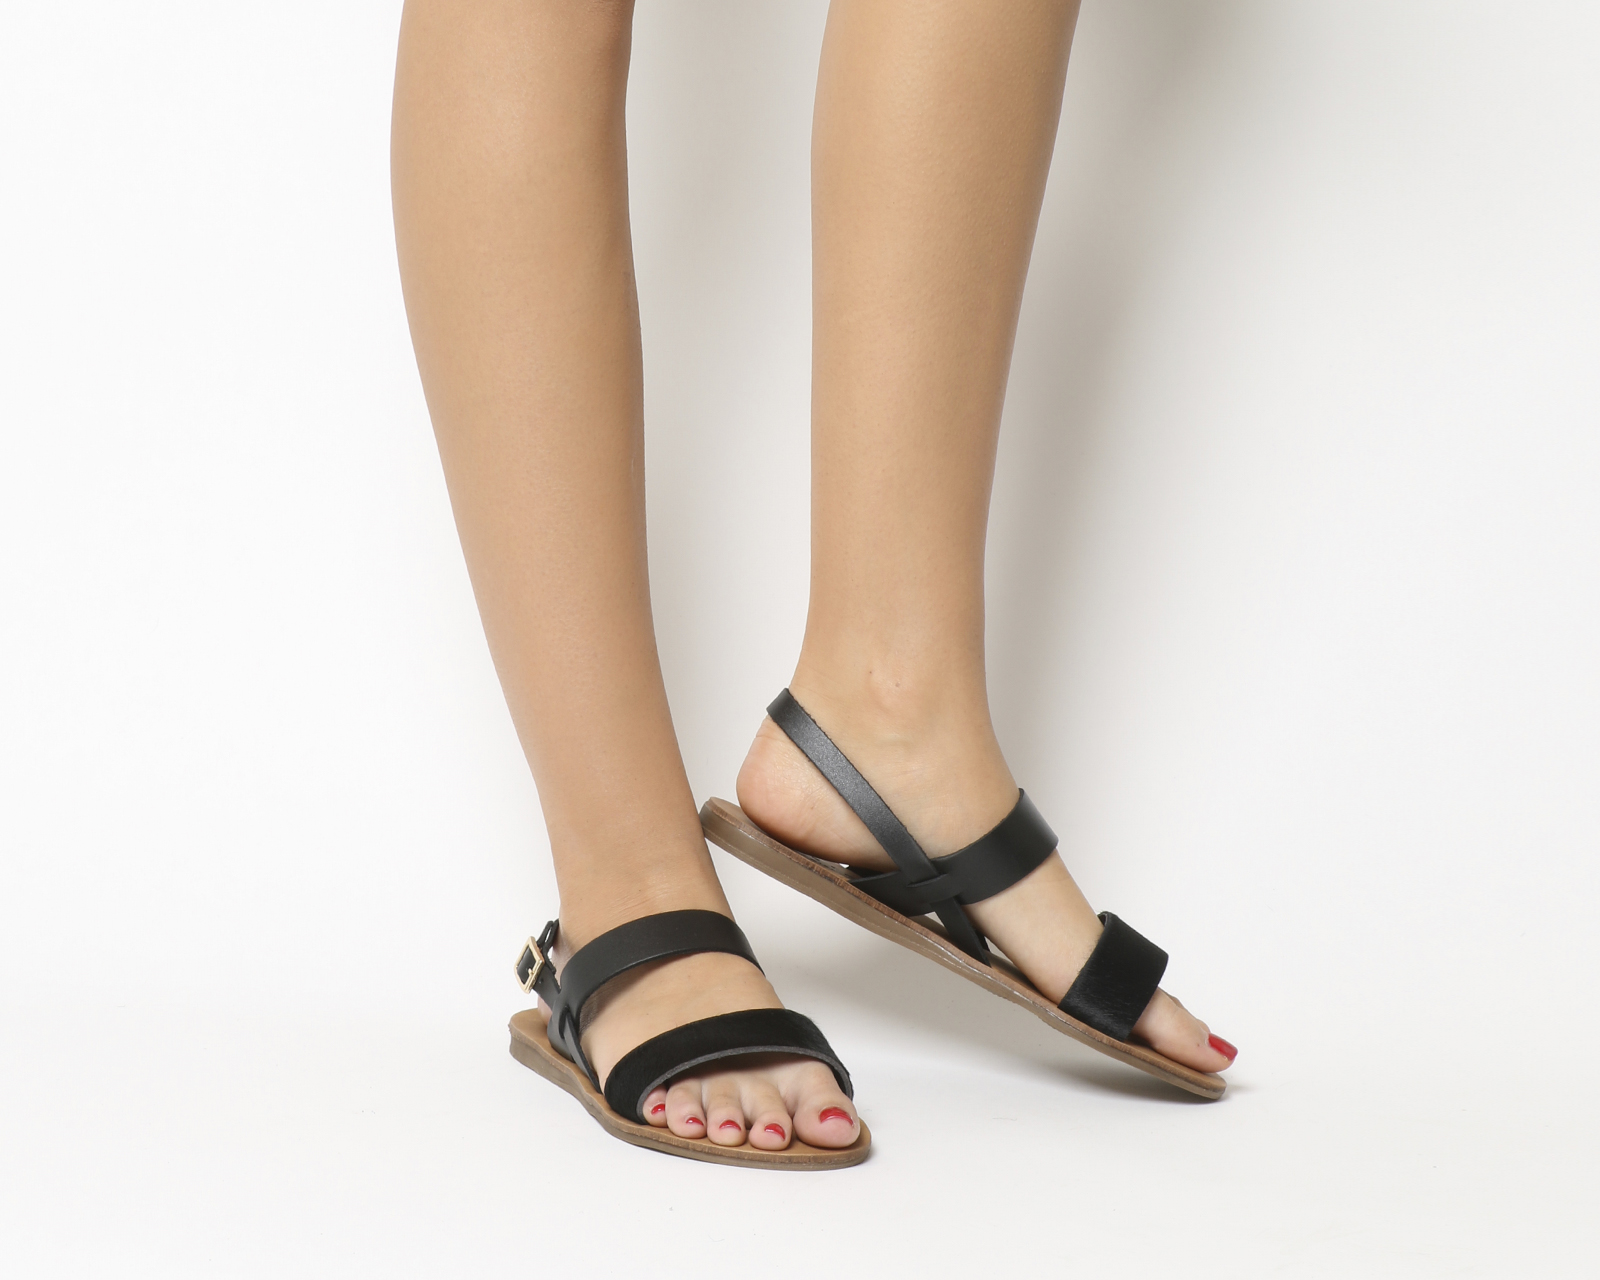 67f56b0a09cb CENTINELA Mujer oficina miel Sling Back sandalias cuero negro PONY con  arena NATURAL único